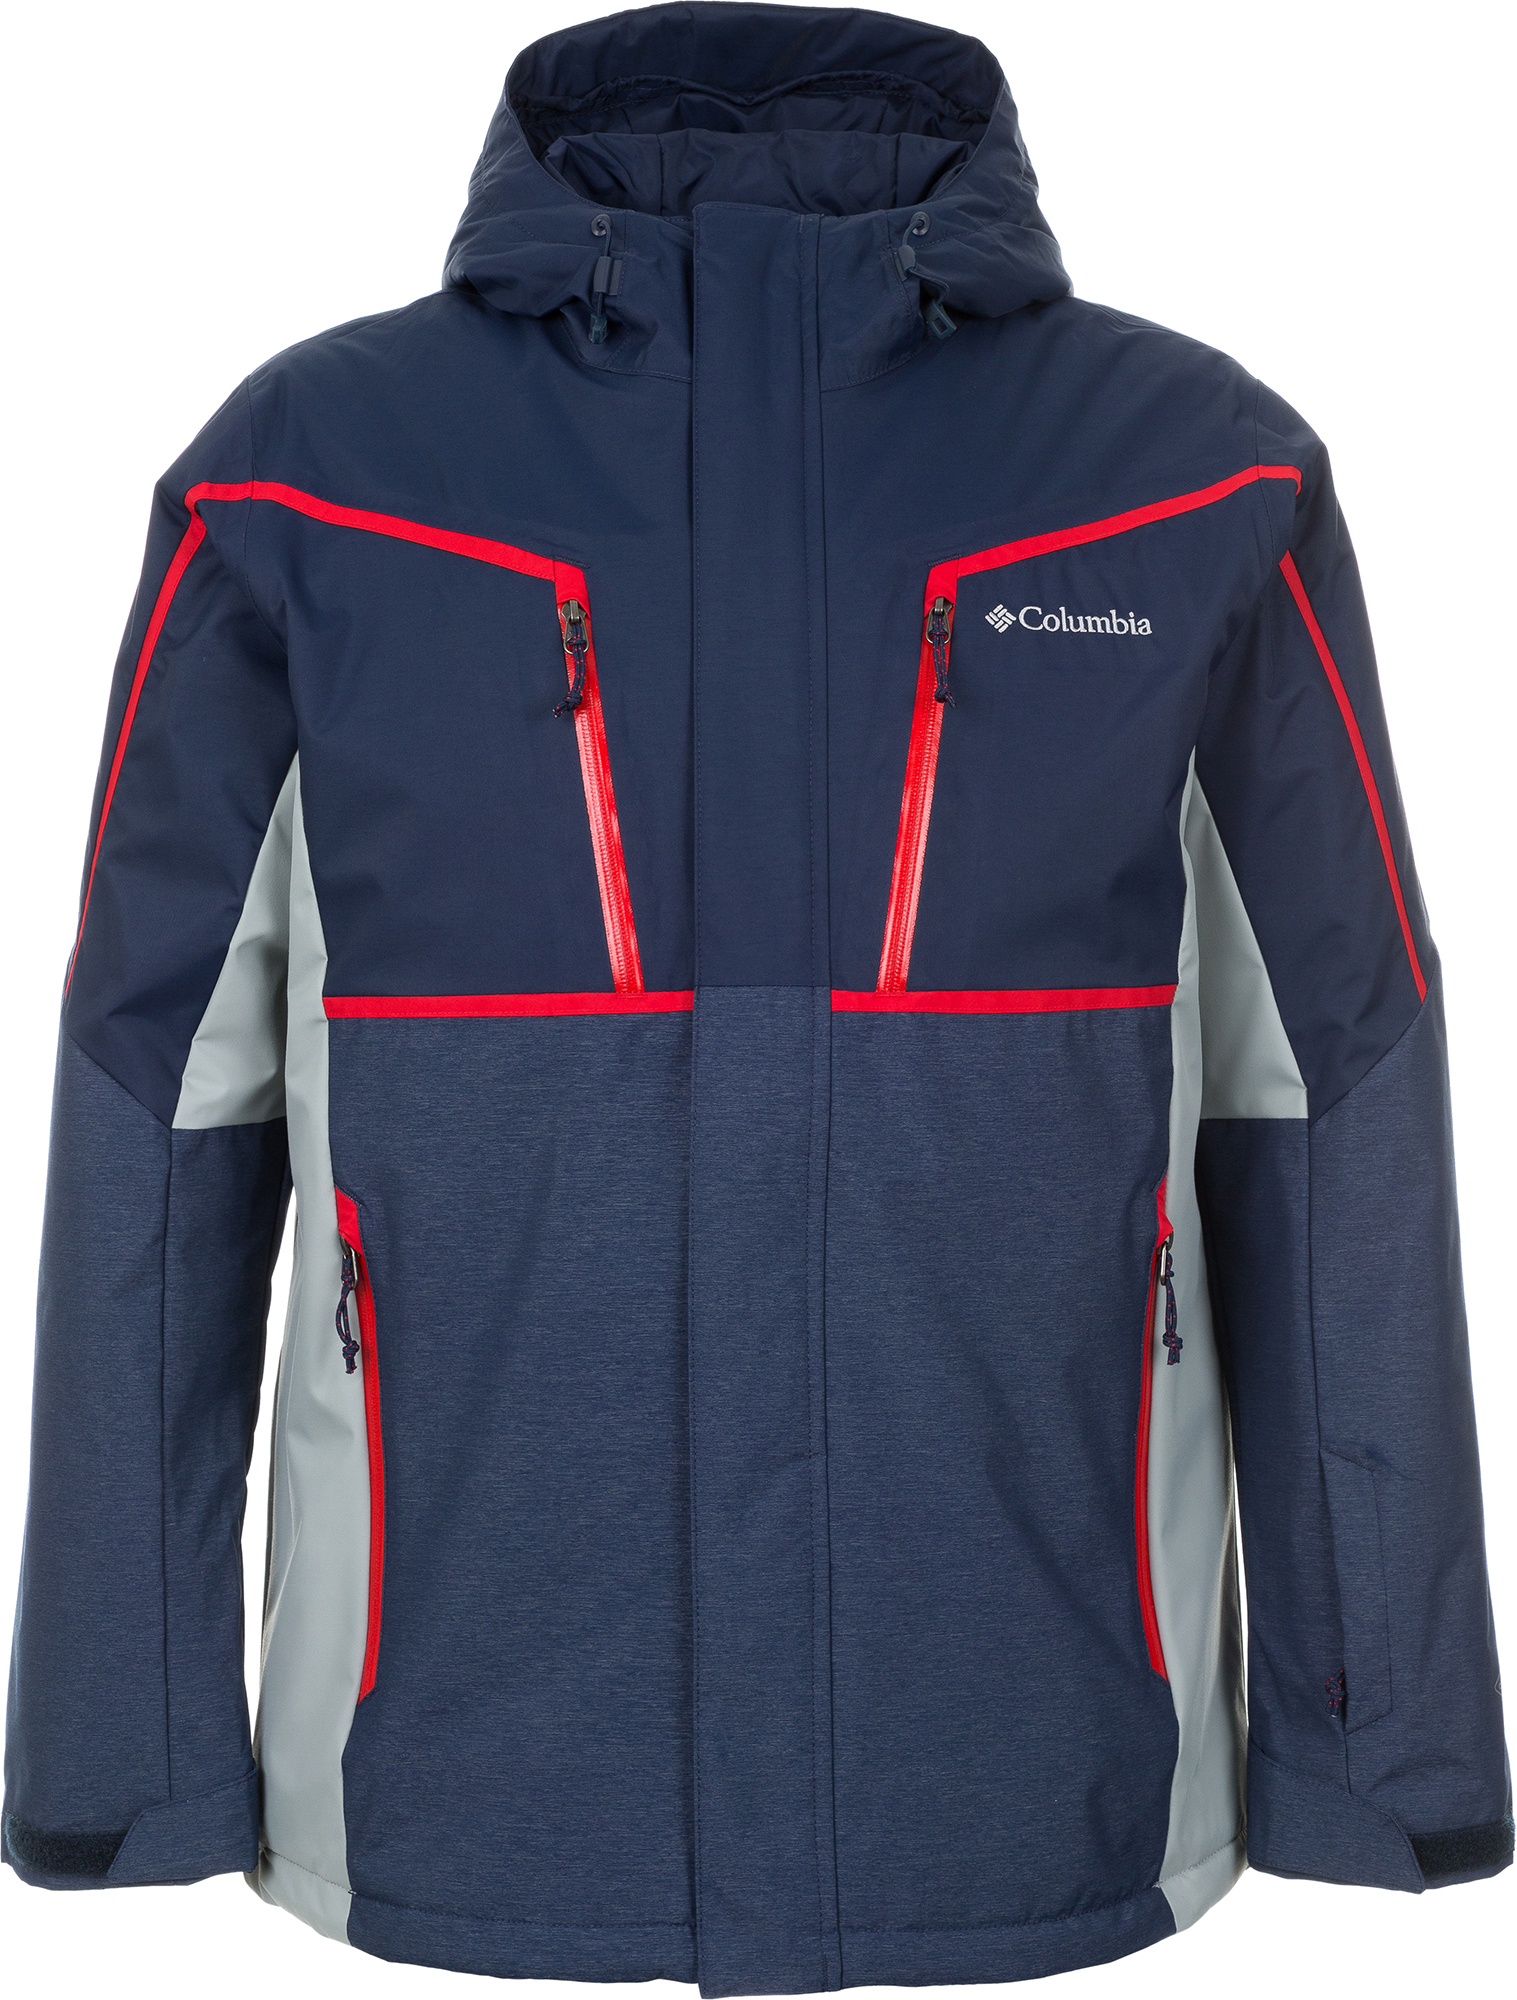 Columbia Куртка утепленная мужская Columbia Kantor Summit II, размер 56-58